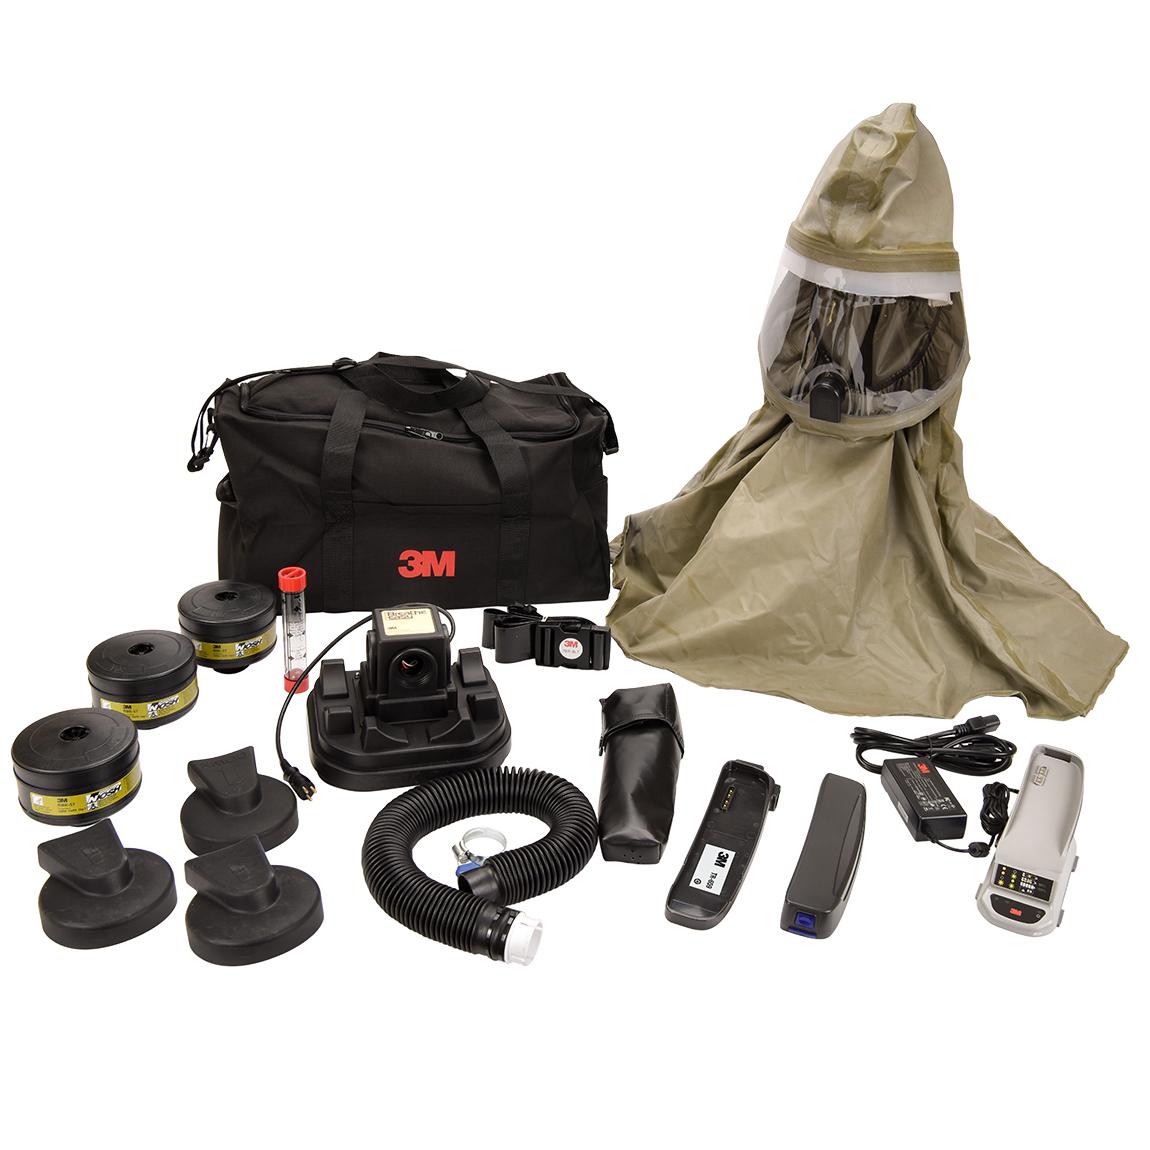 3M Breathe Easy PAPR System - CBRN  Versaflo battery kit image